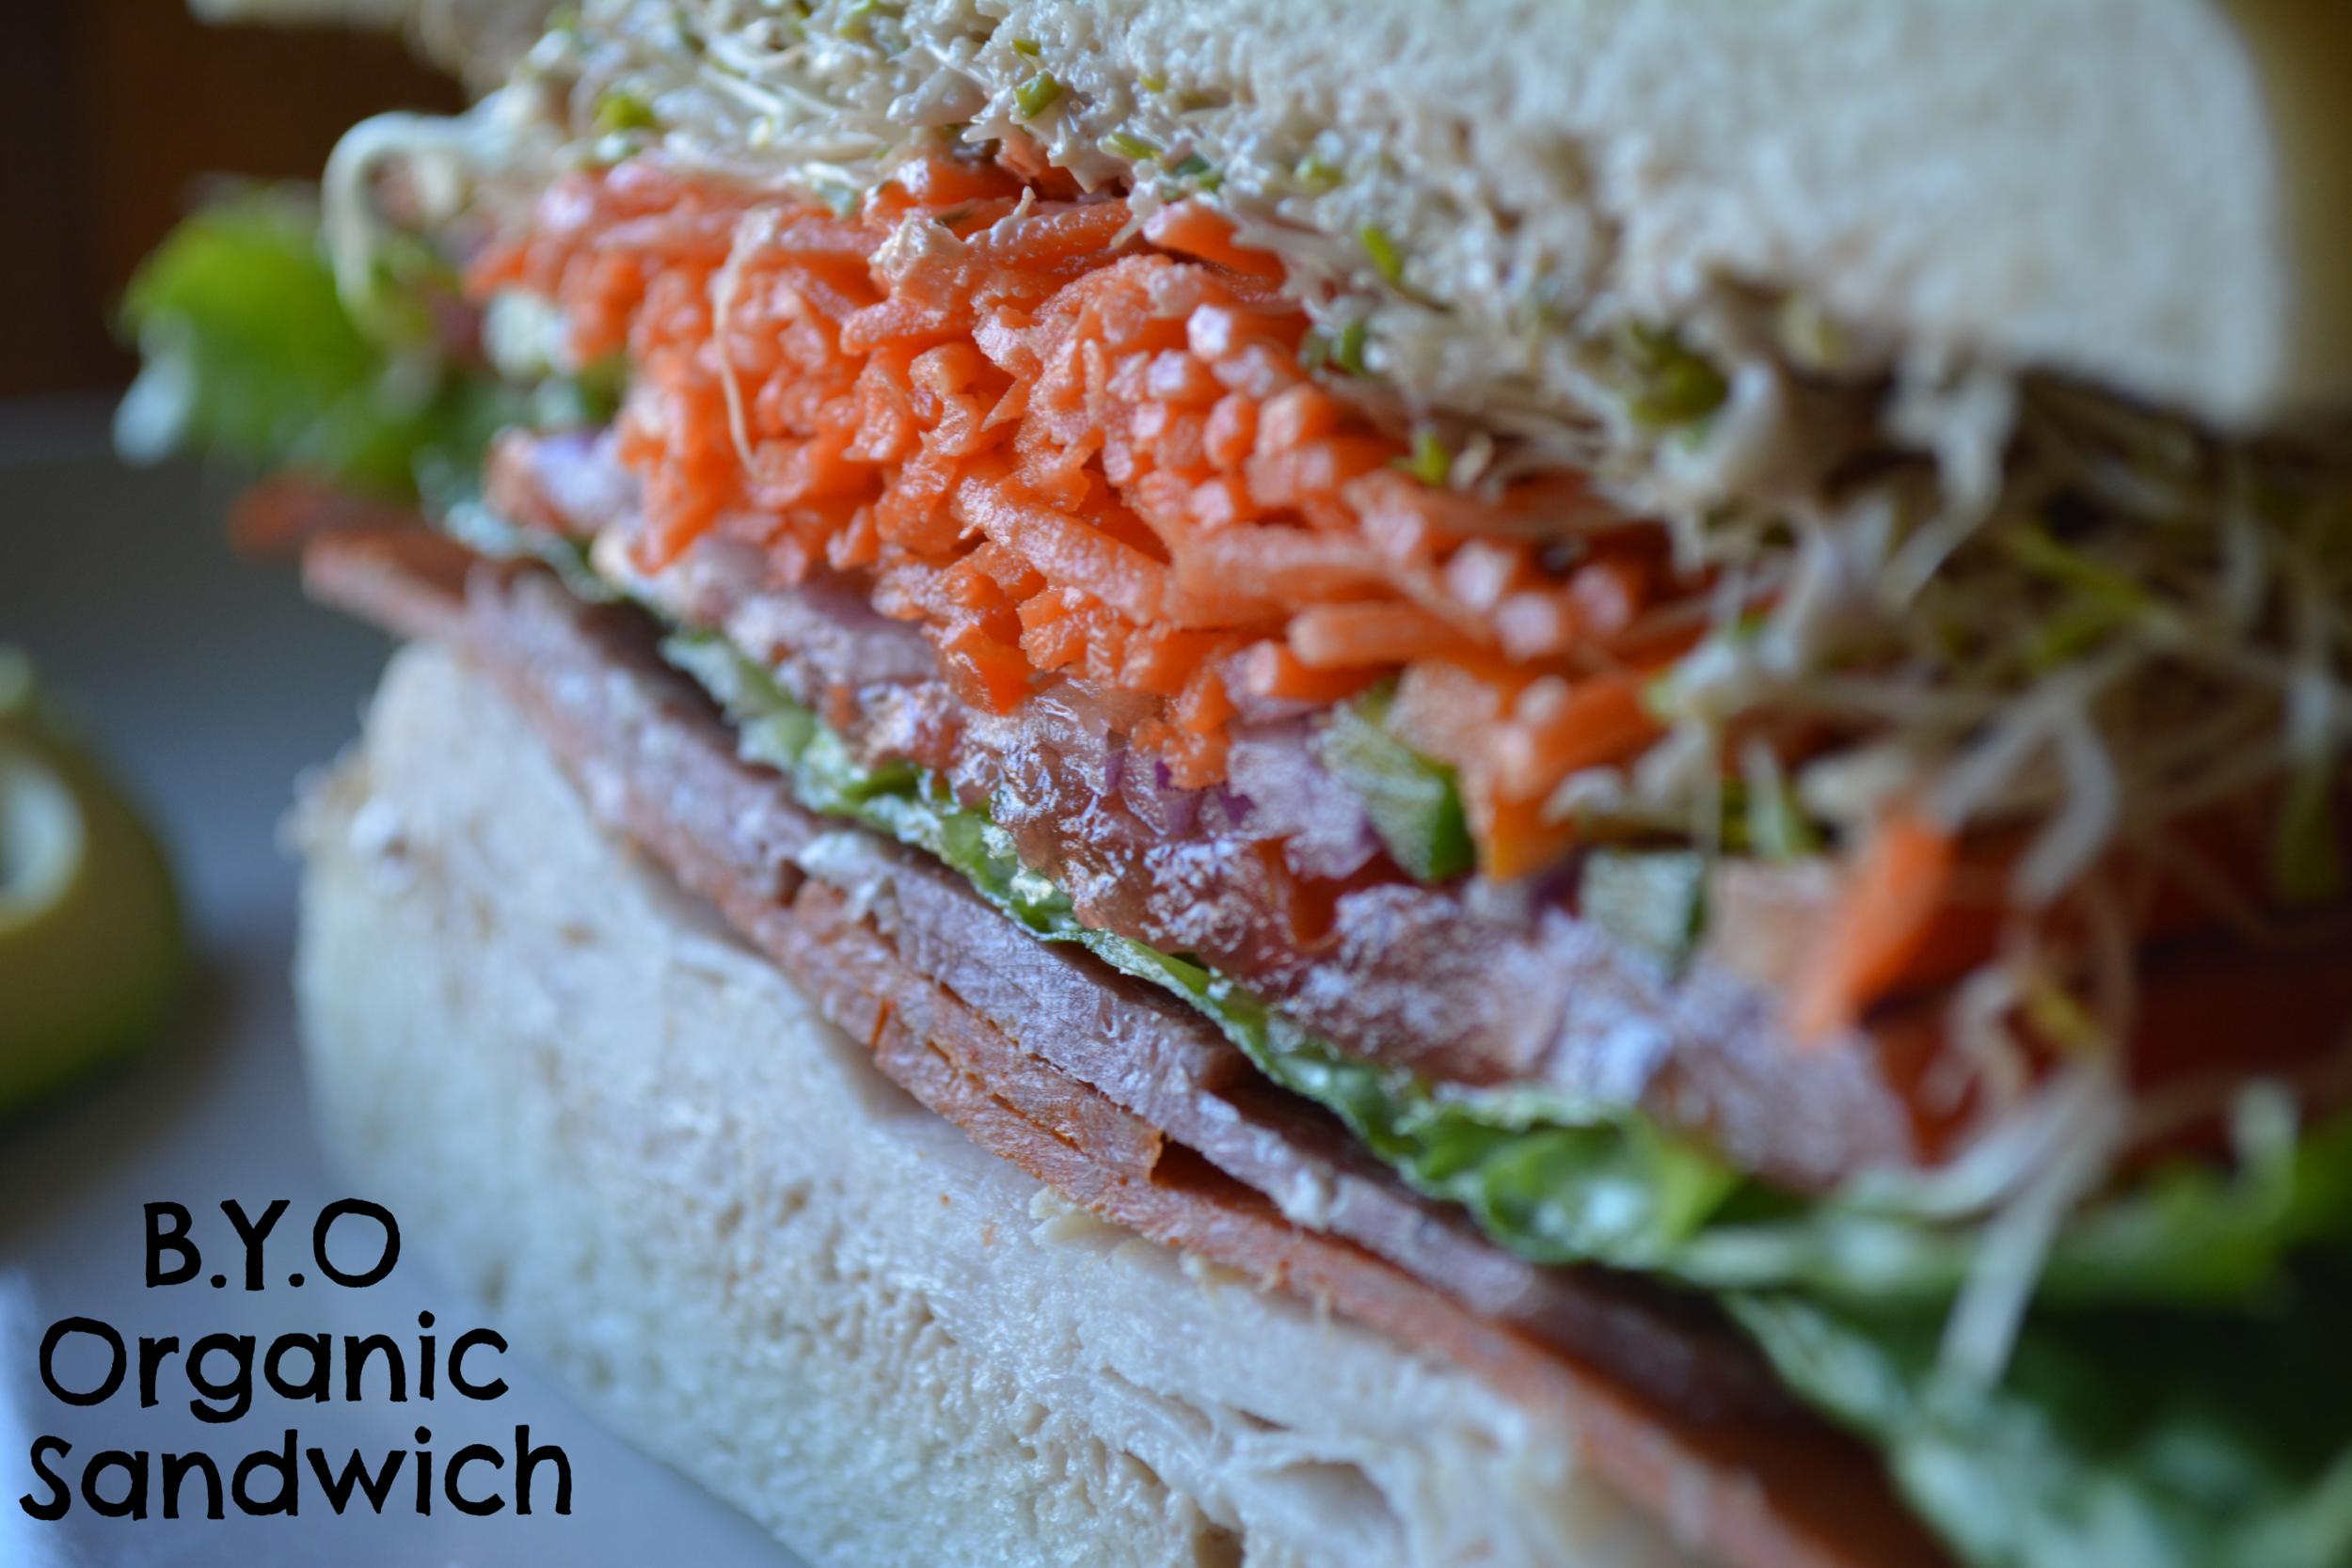 Build Your Own Organic Sandwich